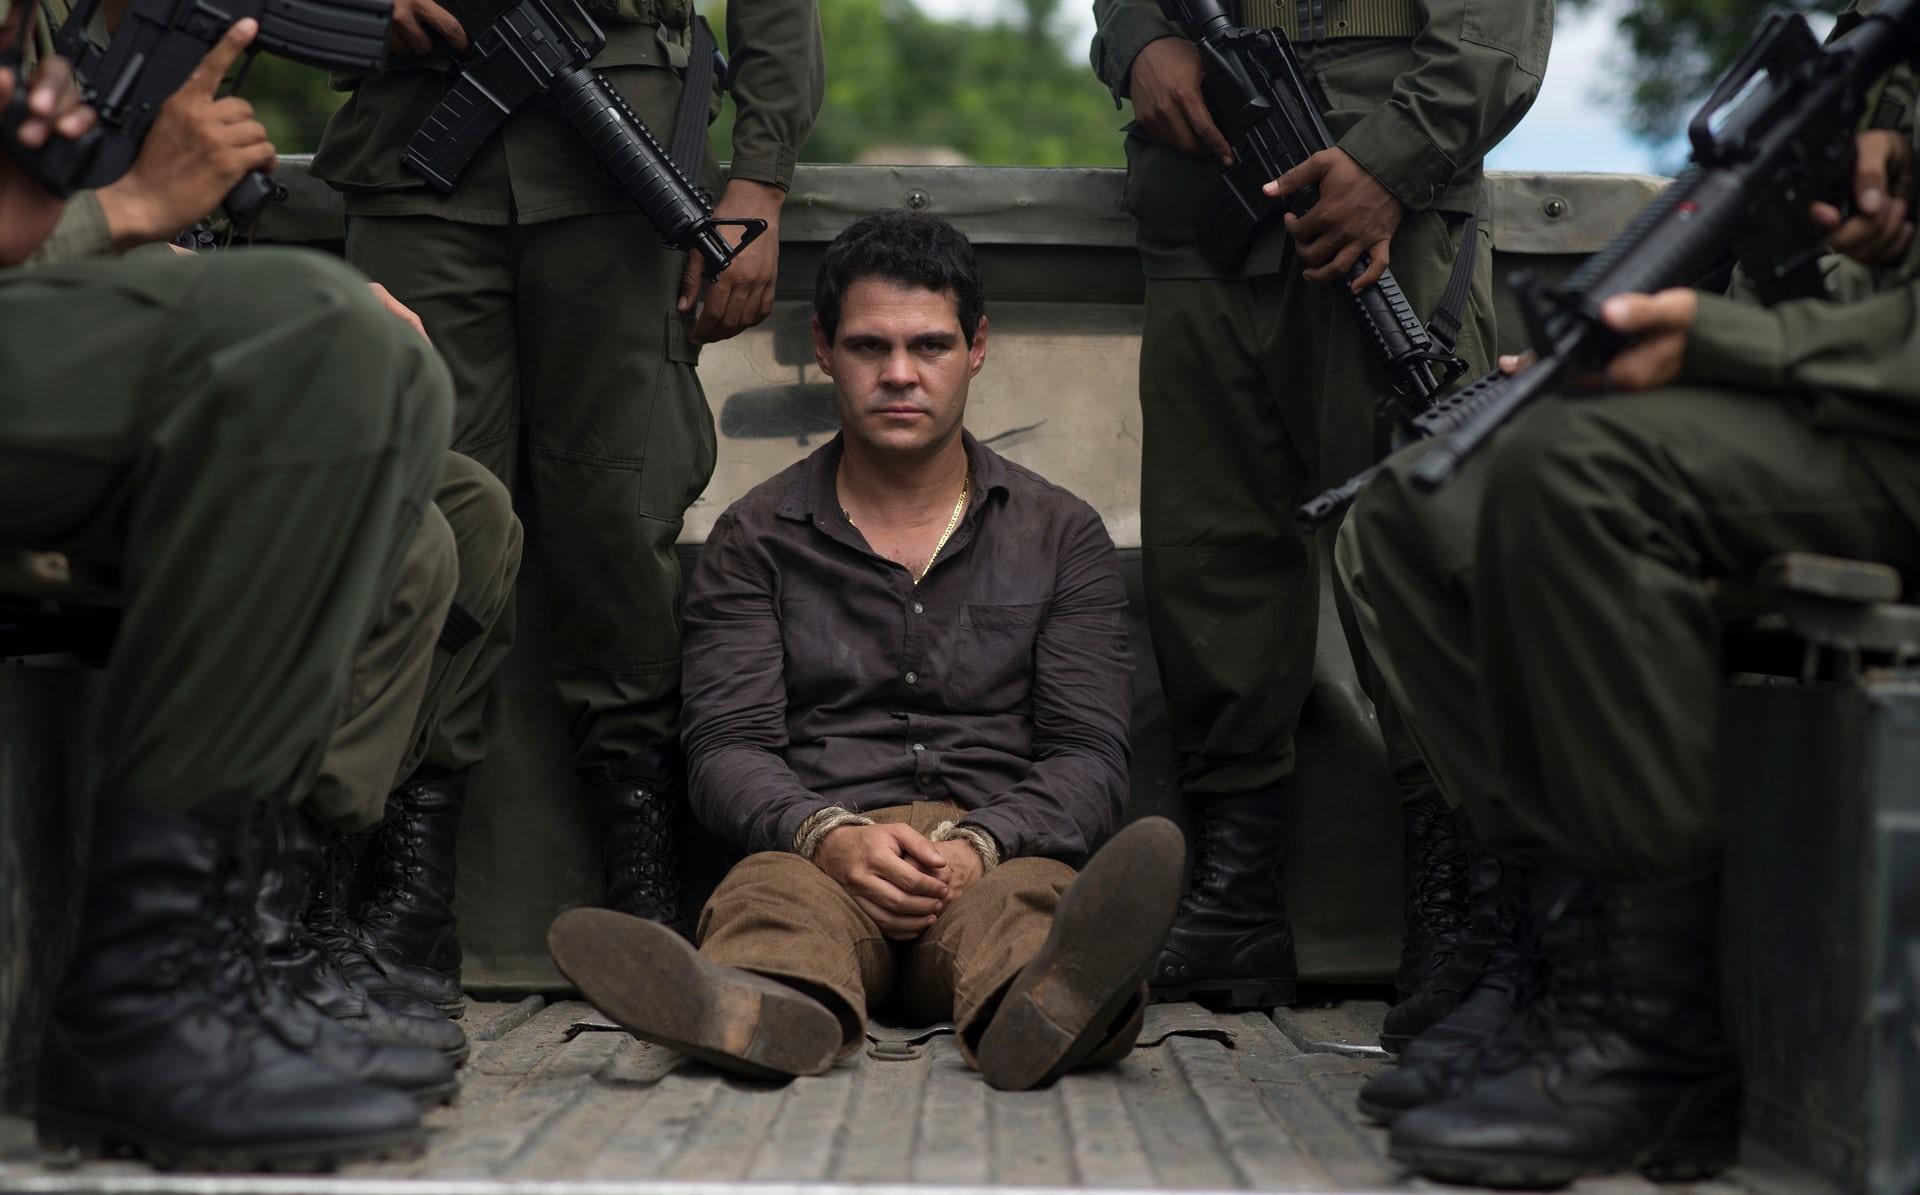 2017 07 21 Marco delao elChapo back of the truck